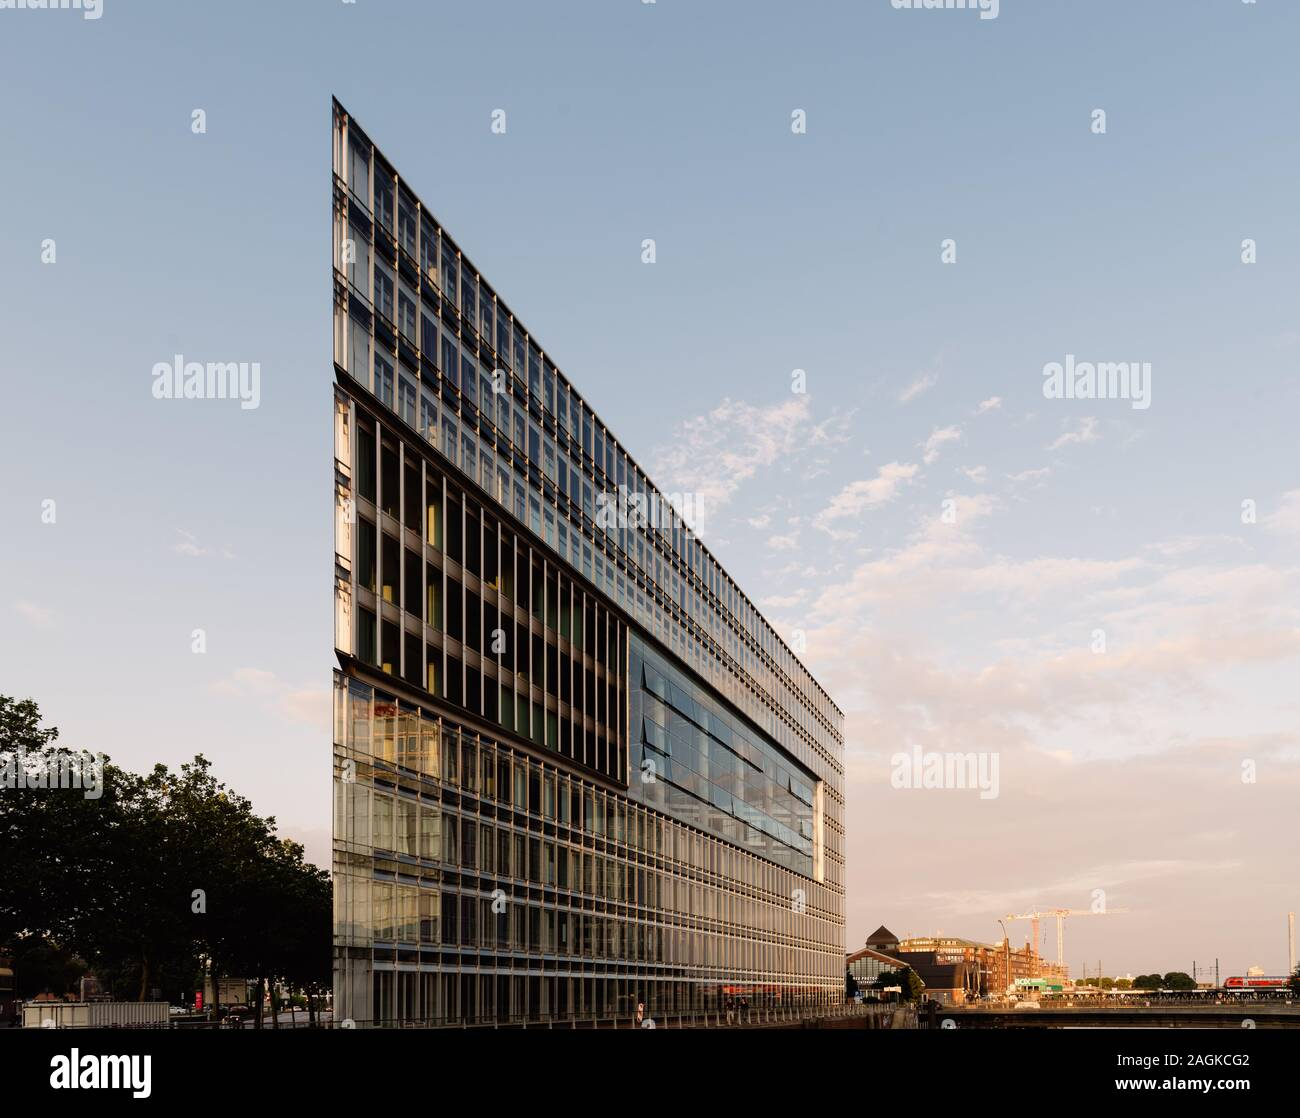 Hamburg, Germany - August 3, 2019: Deichtor Office Building in the port of Hamburg, designed by Hadi Teheran architect Stock Photo